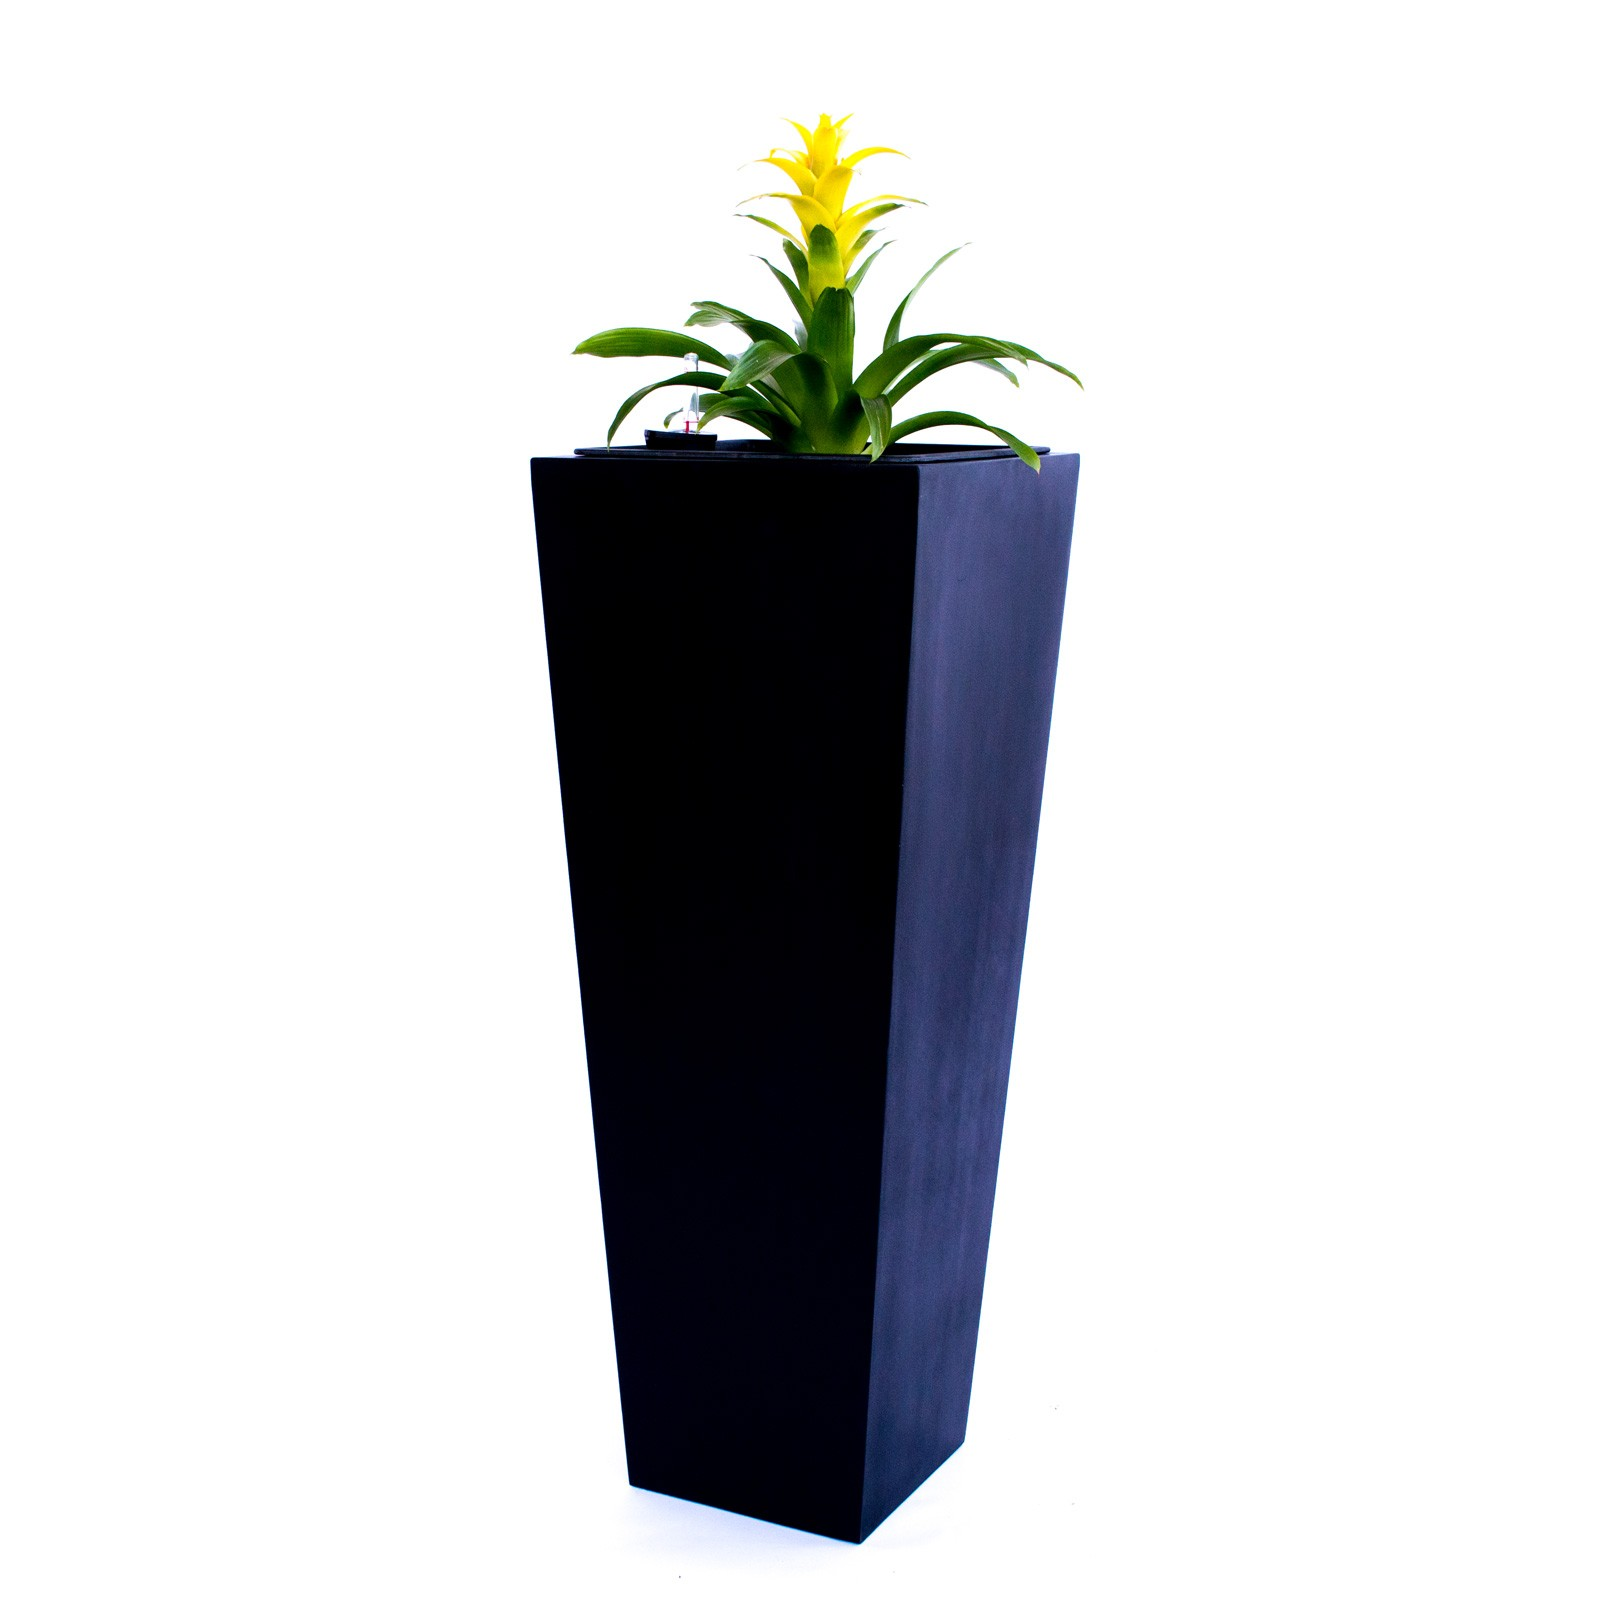 pflanzk bel blumenk bel fiberglas s ule konisch 38x38x100cm elegant schwarz matt. Black Bedroom Furniture Sets. Home Design Ideas